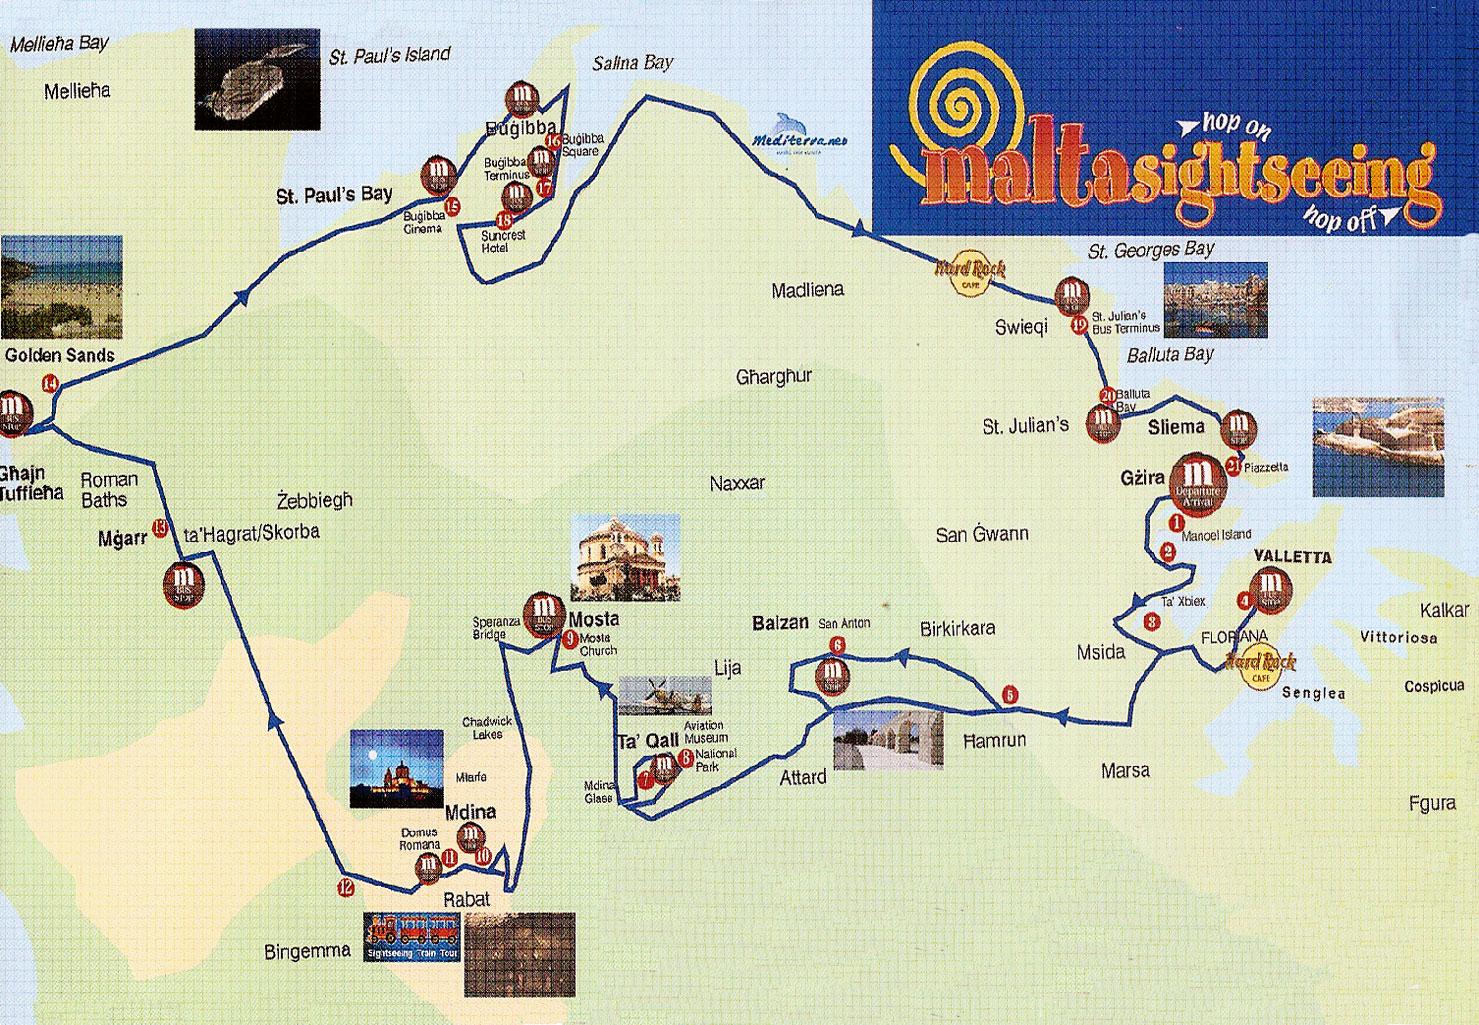 Malta Tourist Map Malta mappery